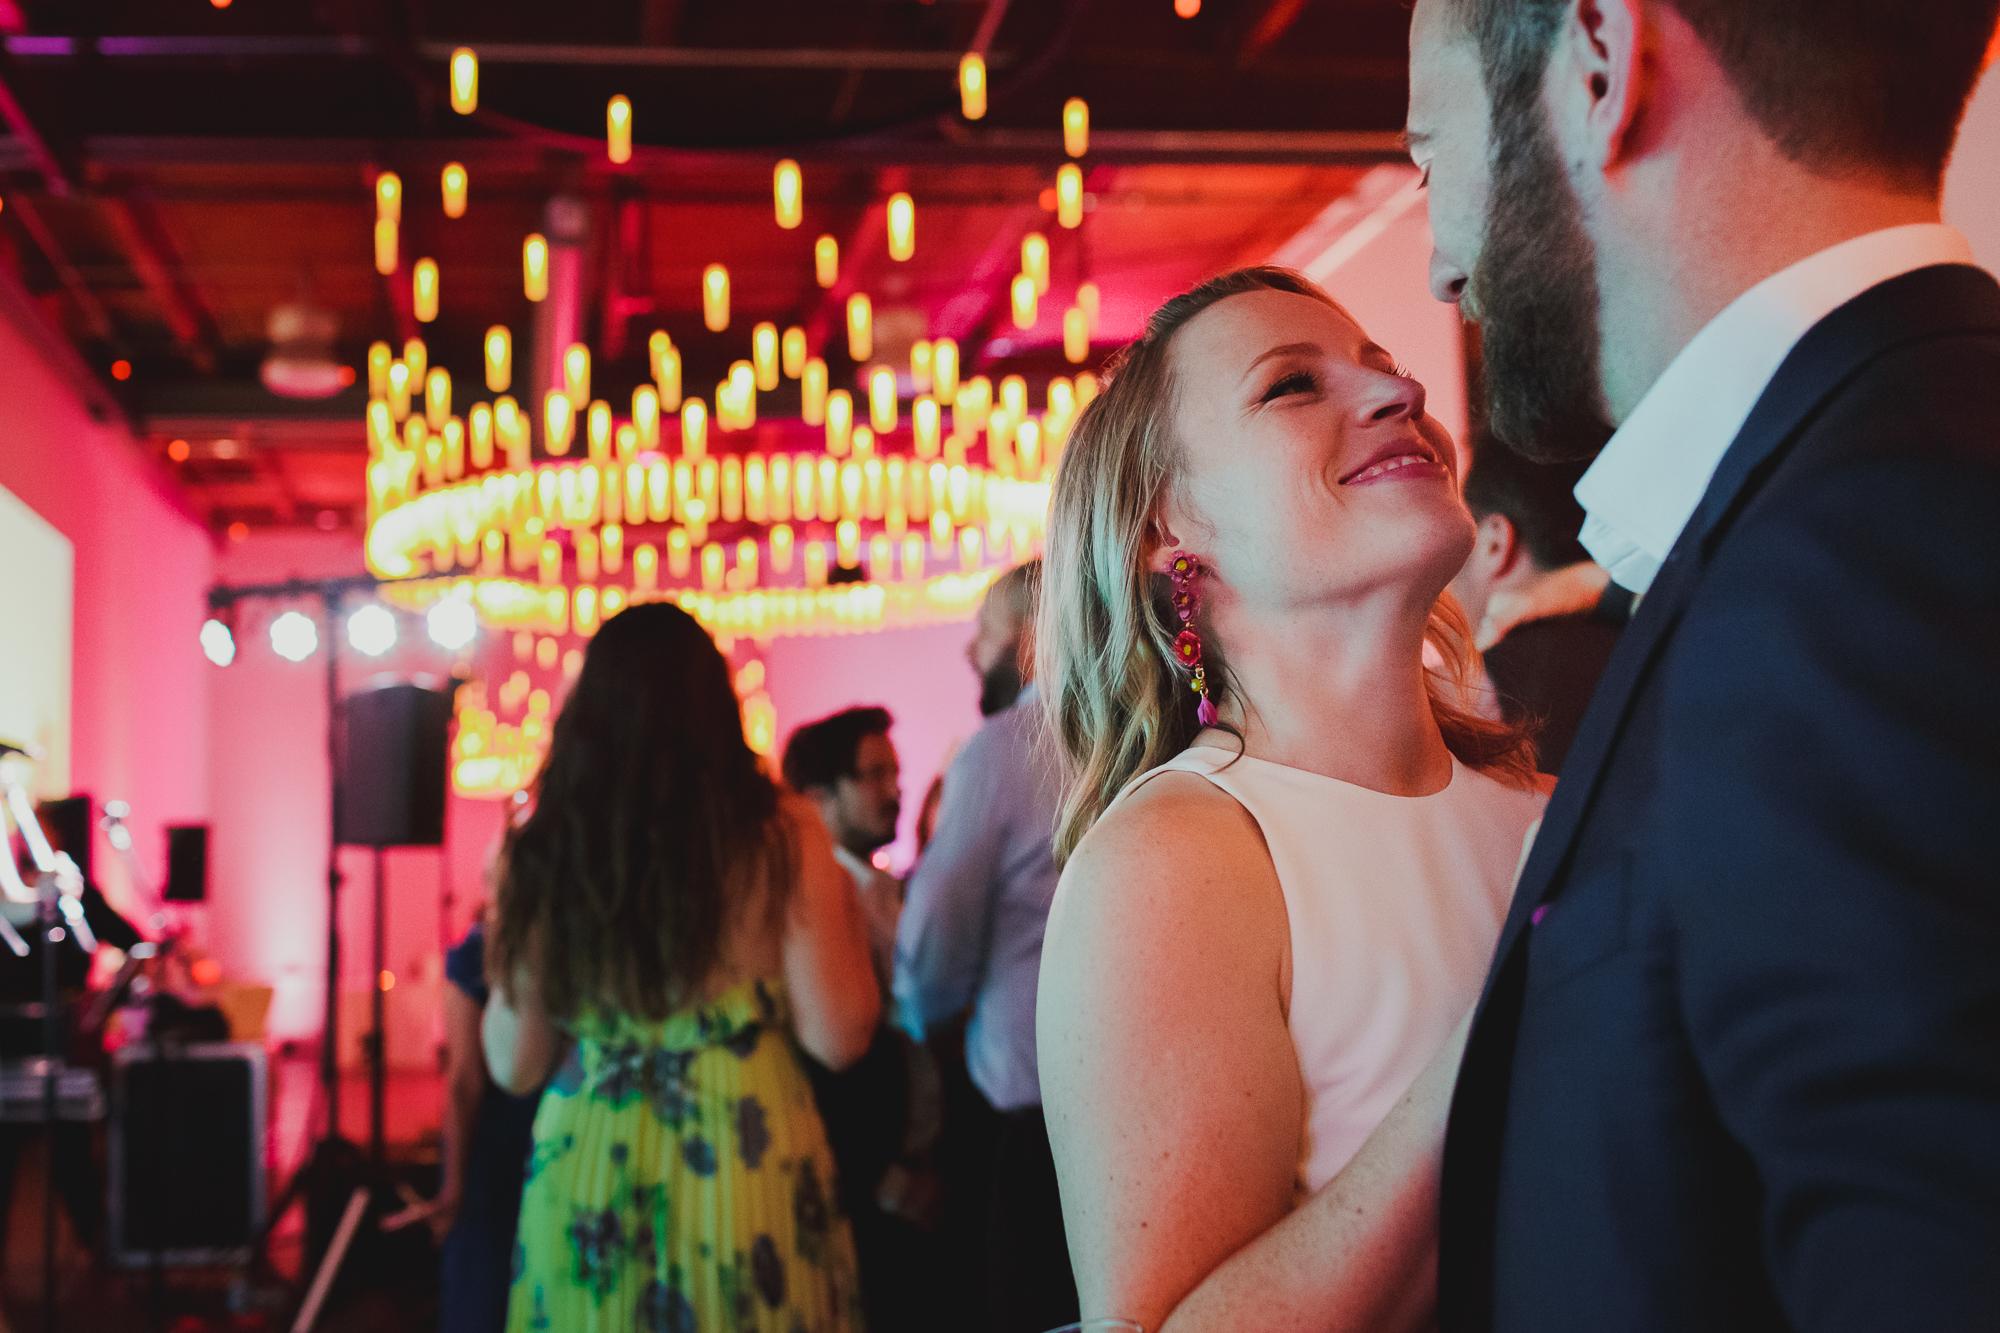 canvas event space wedding photos by Krista Welch-0158.jpg